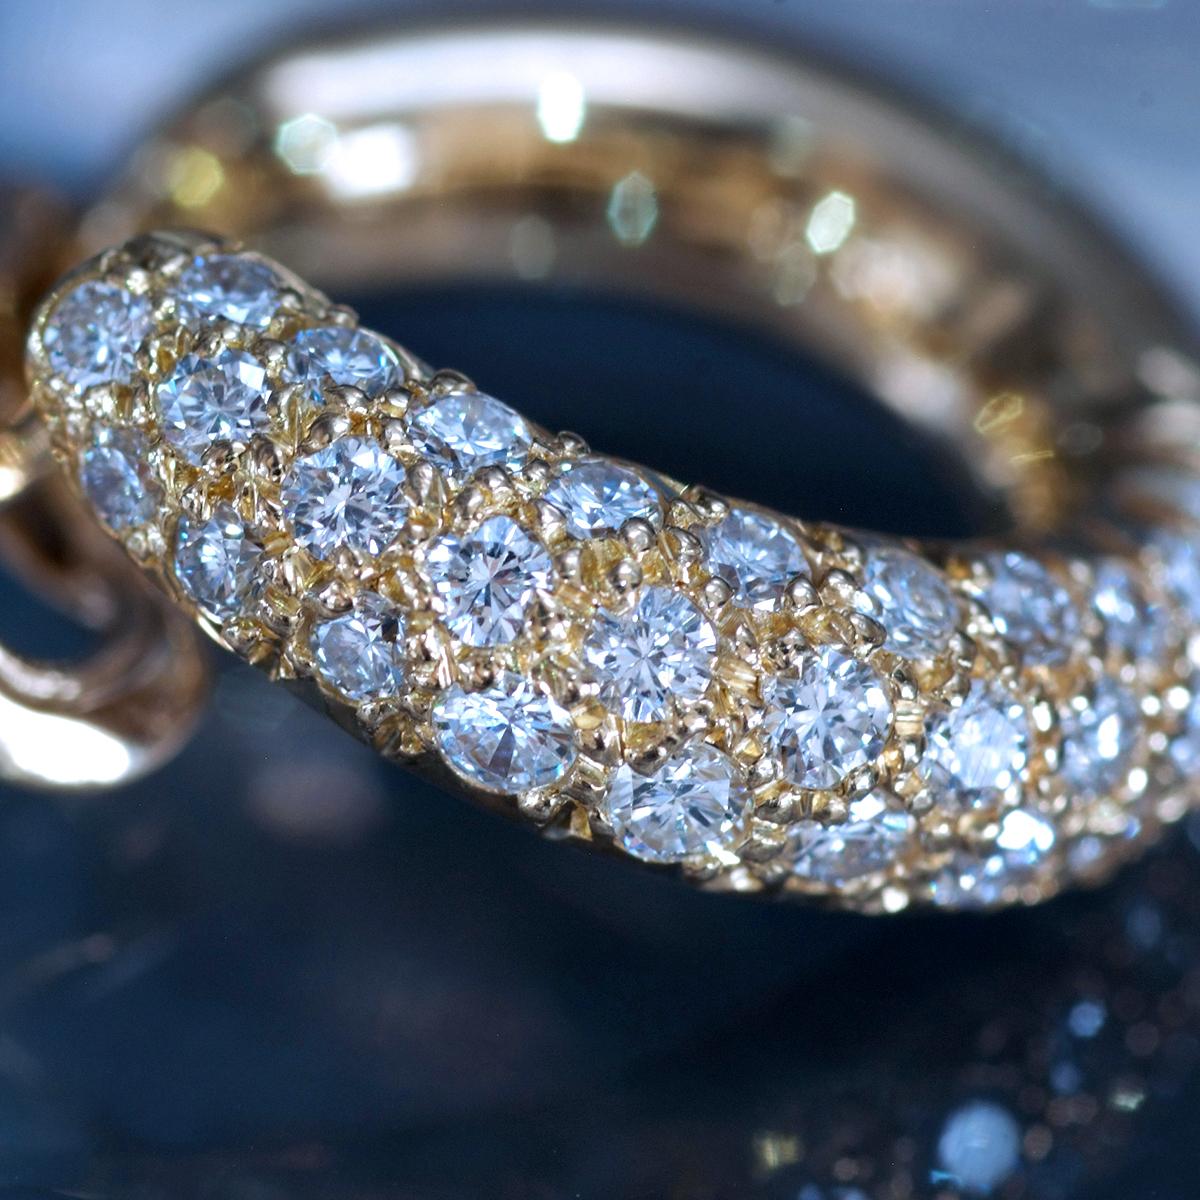 E9112【VAN CLEEF&ARPELS】ヴァンクリーフ&アーペル 絶品ダイヤ 最高級18金シングルピアス 重量4.38g 幅19.1×5.0mm 【買取&下取可能】_画像4